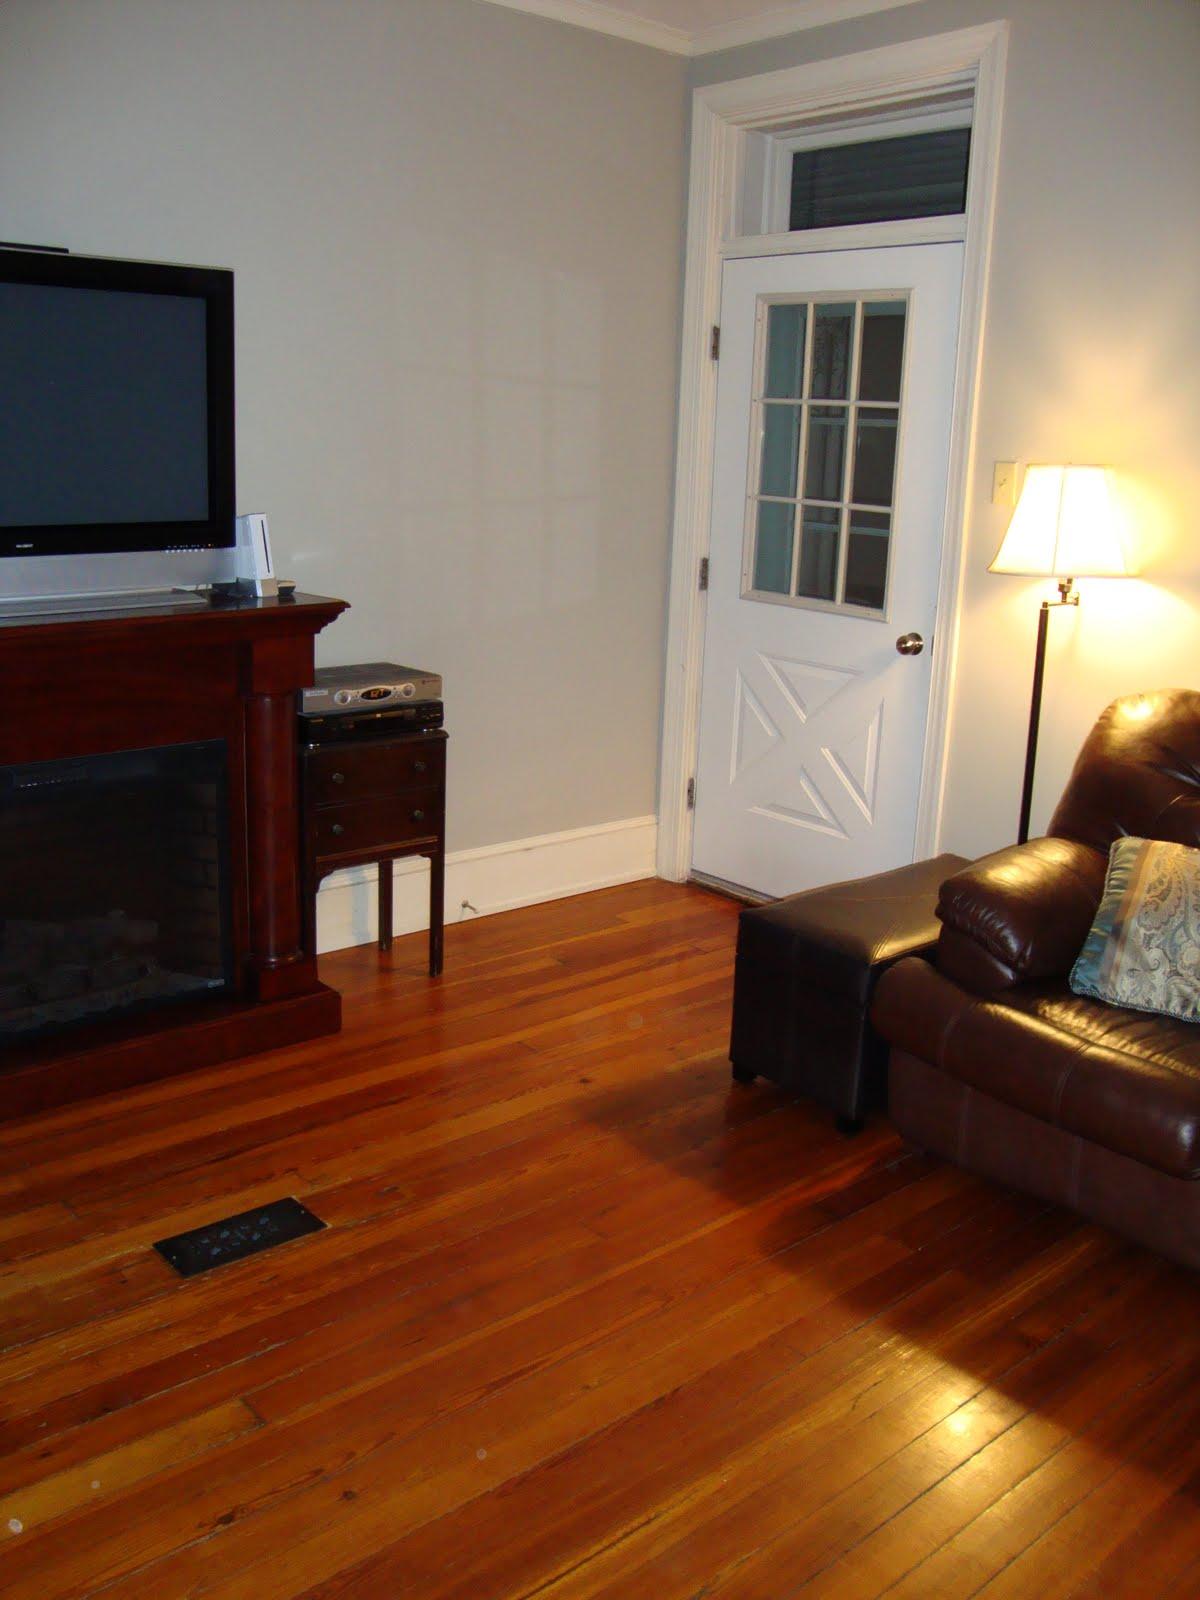 27 South 3rd Street Perkasie, PA: Living Room ~ 17 x 12 ft ...